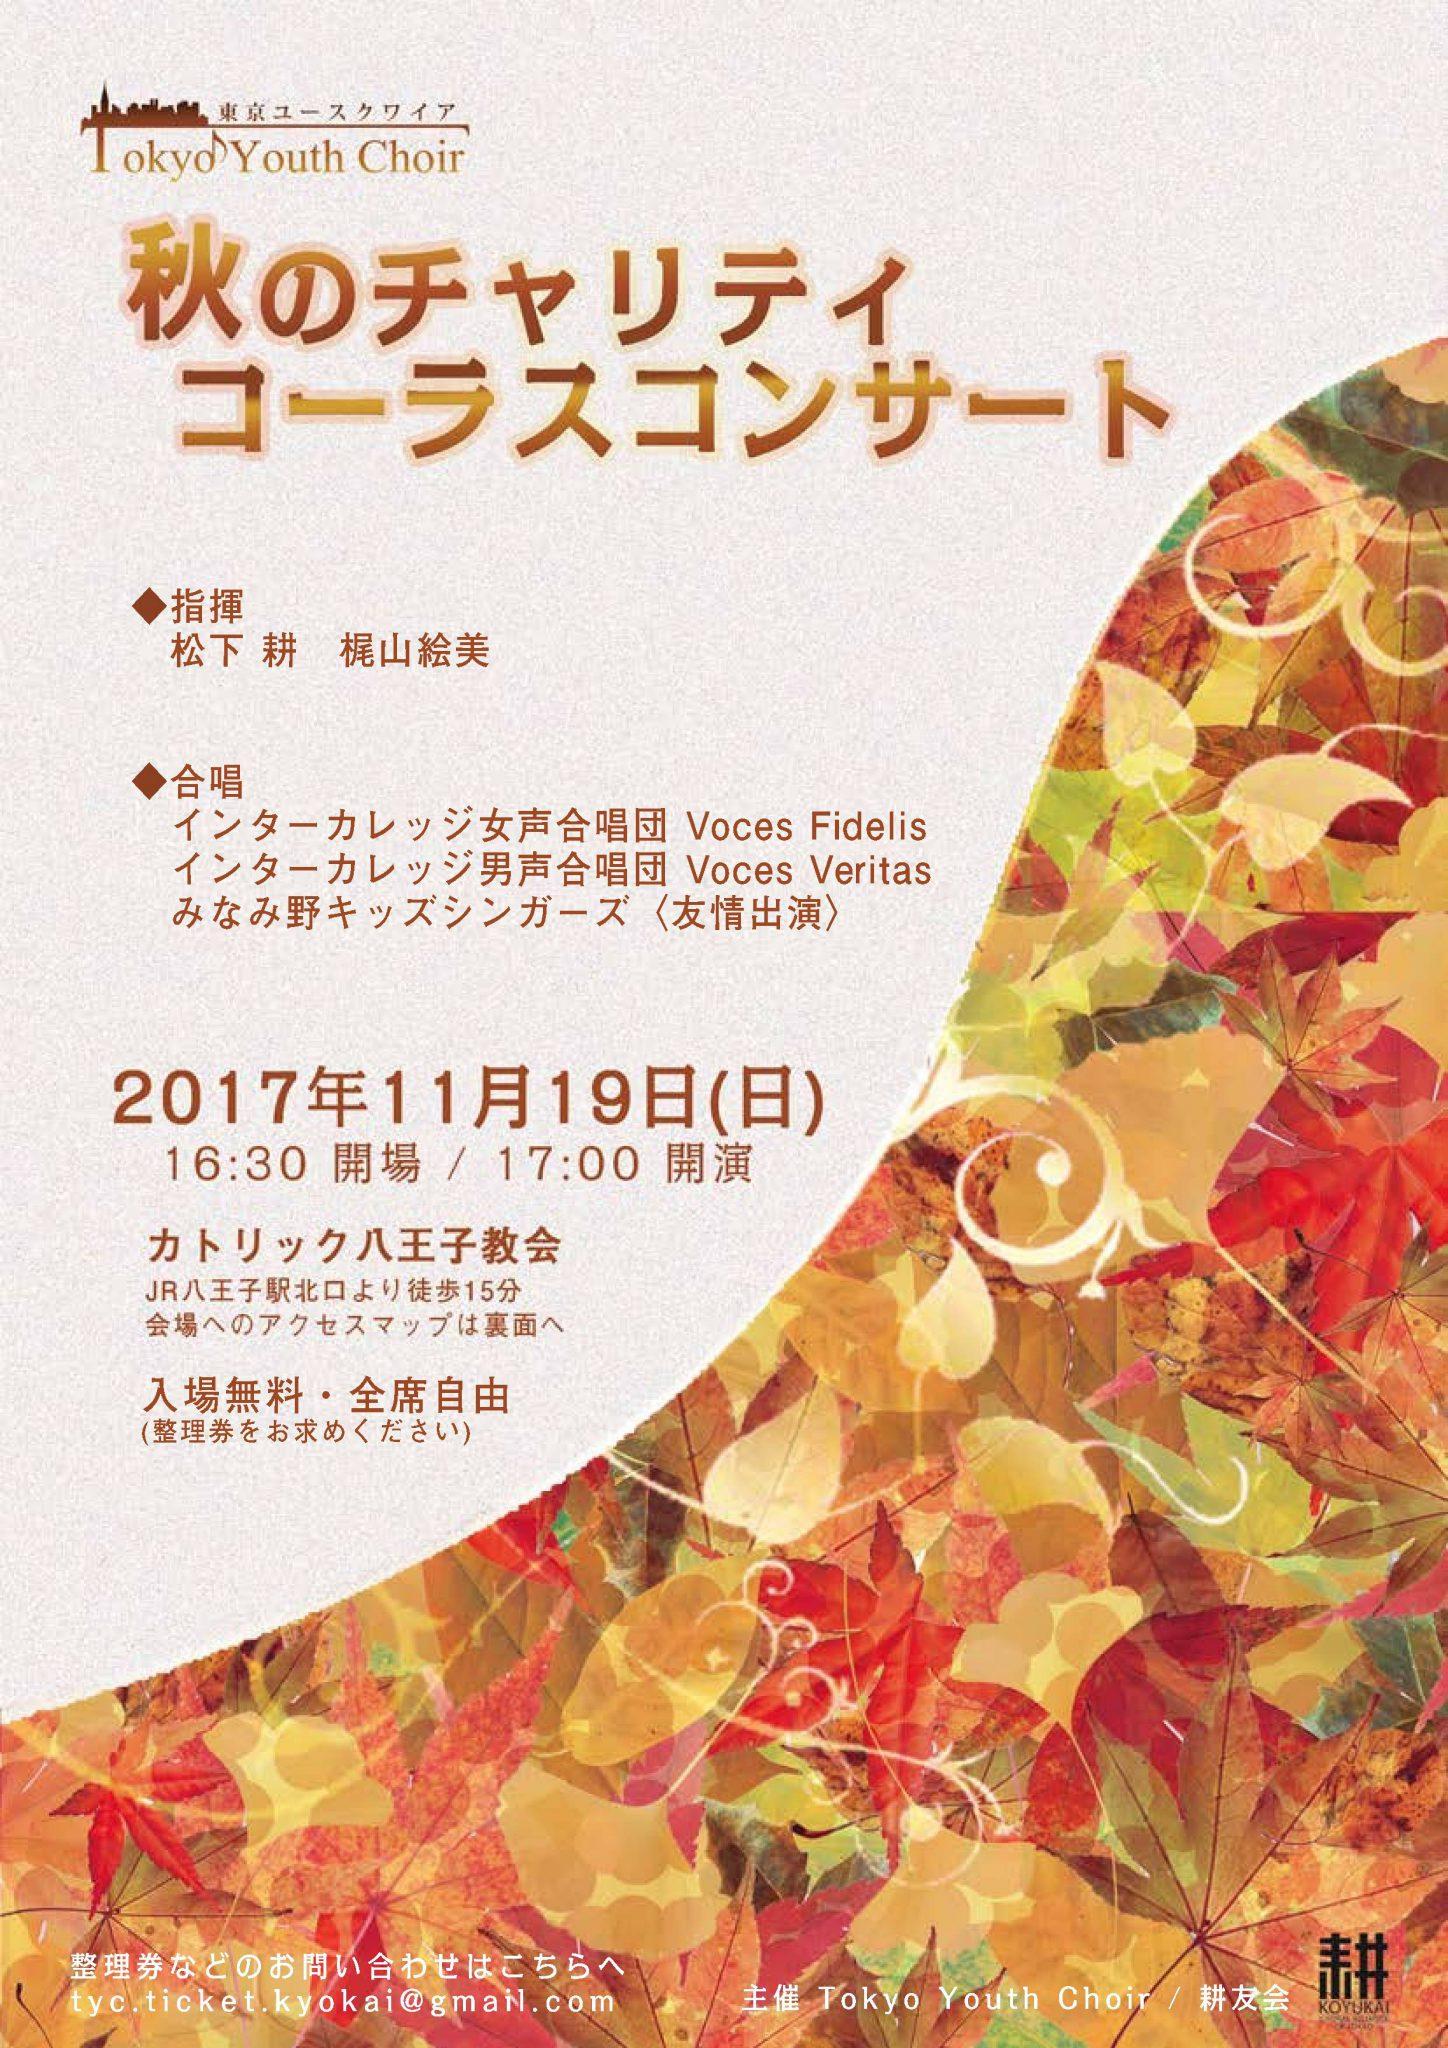 TYC Voces Veritas Voces Fidelis 混声合唱 男声合唱 女声合唱 ぼーべー ぼーふぃー 演奏 合唱 教会コンサート 耕友会